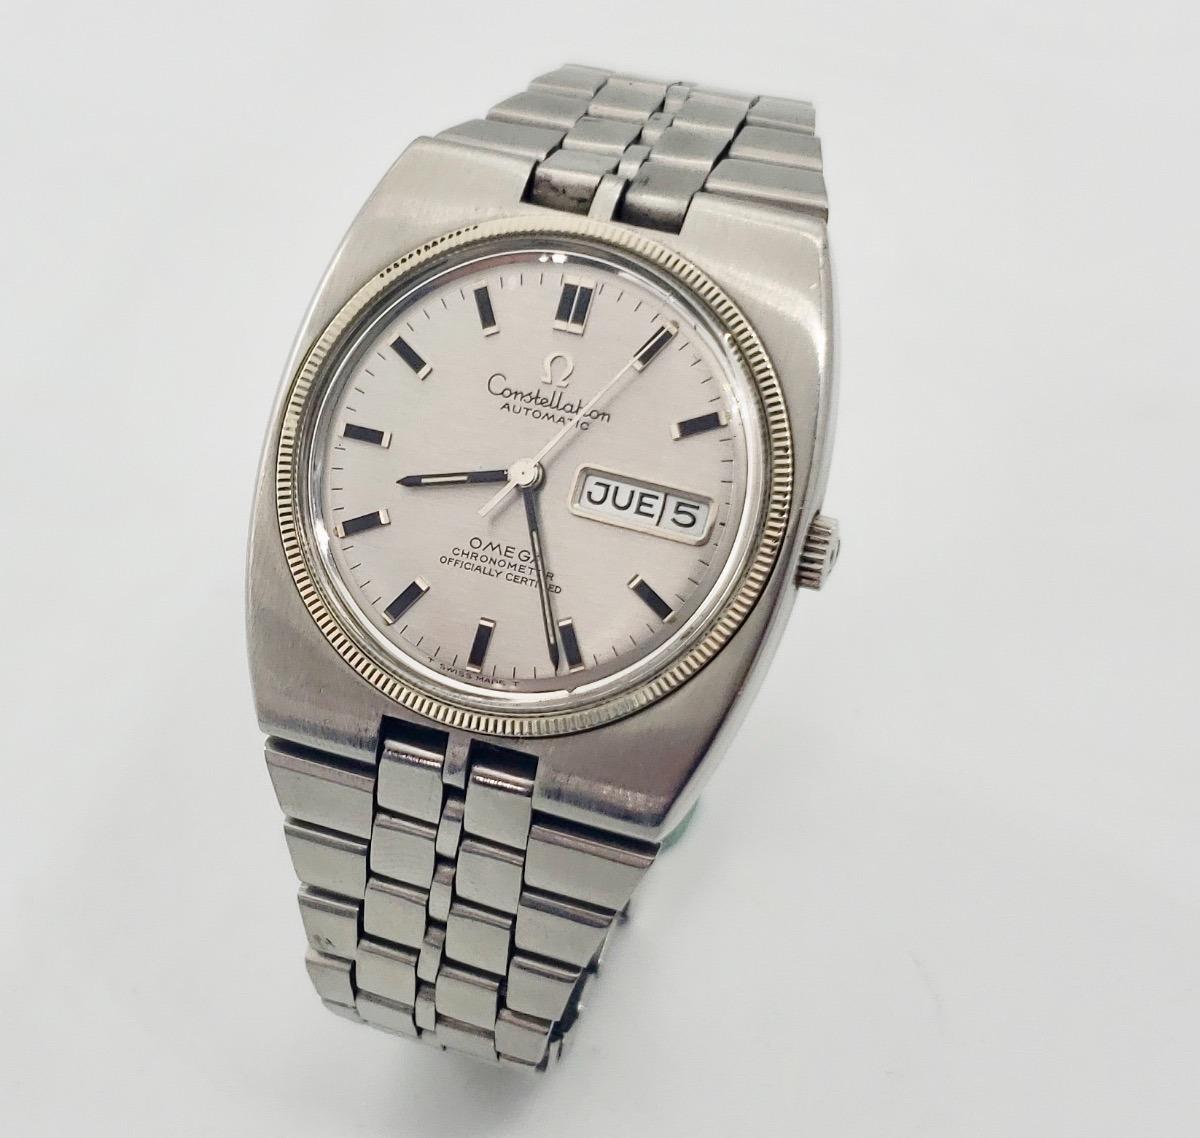 6cfef32a8584 Reloj Omega Constellation Automatico Funcionando Perfecto - $ 9,200.00